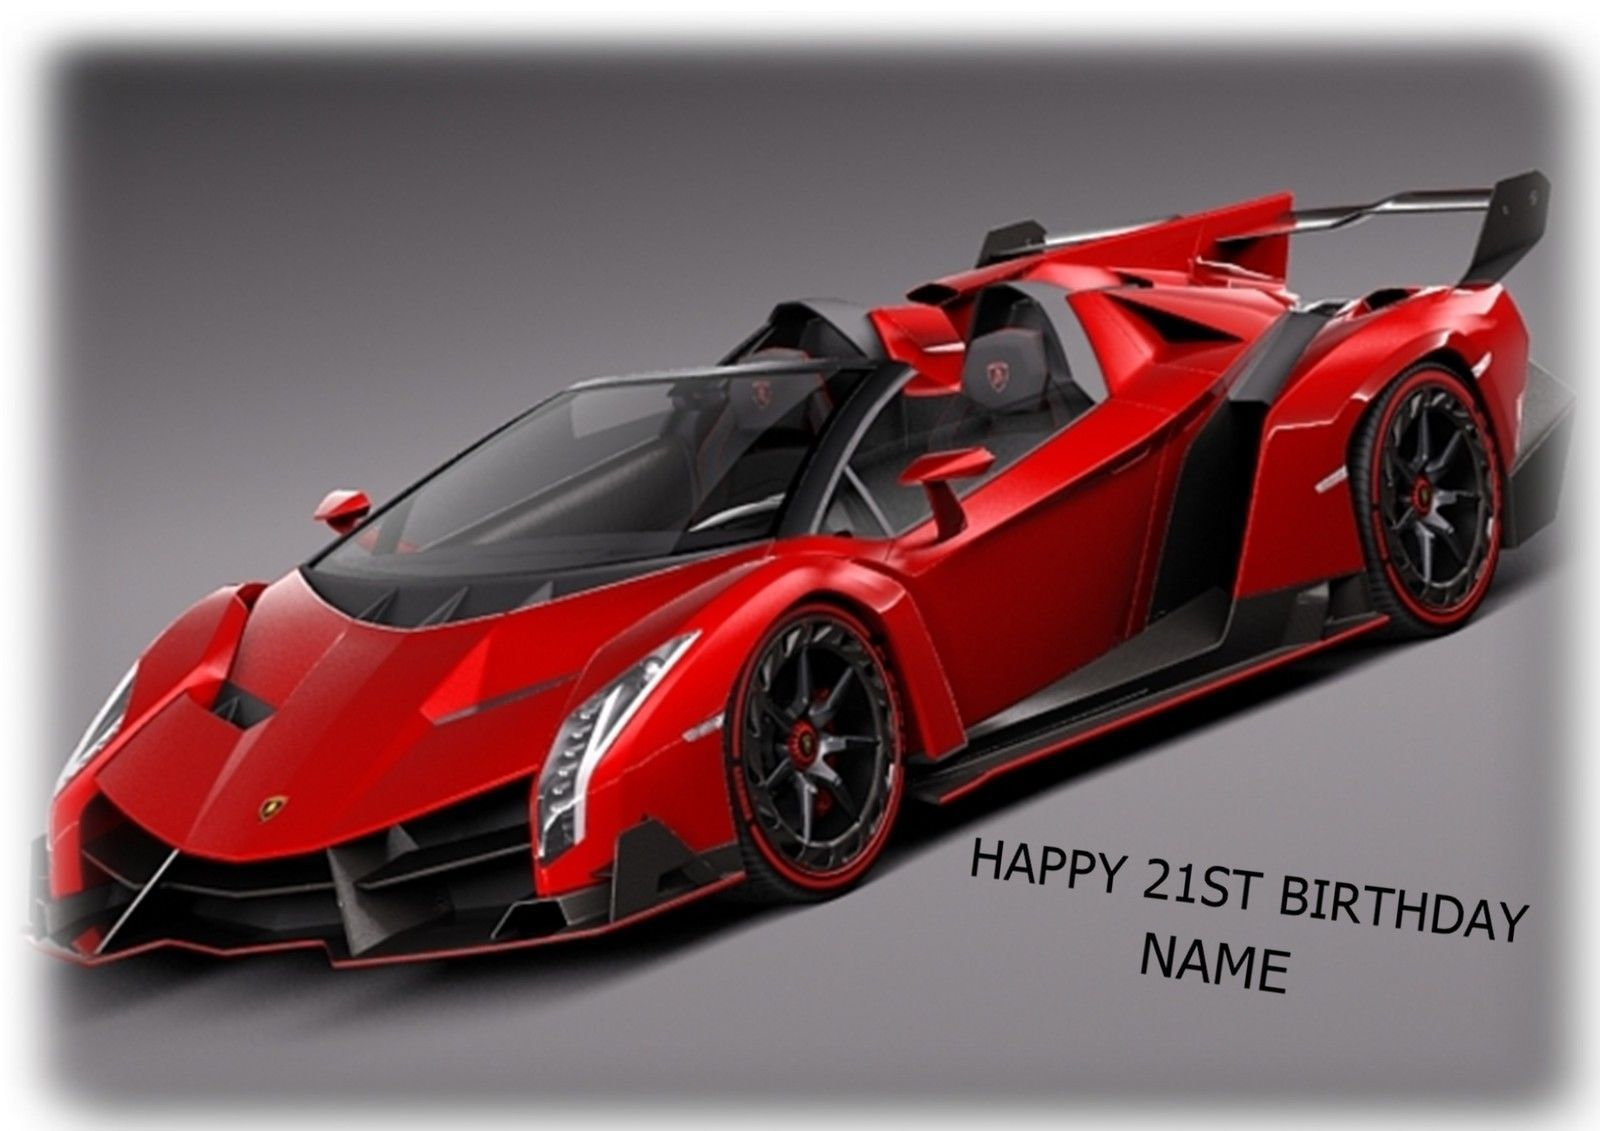 Lamborghini Racing Sports Car A4 Rectangle Cake Topper Wafer Card